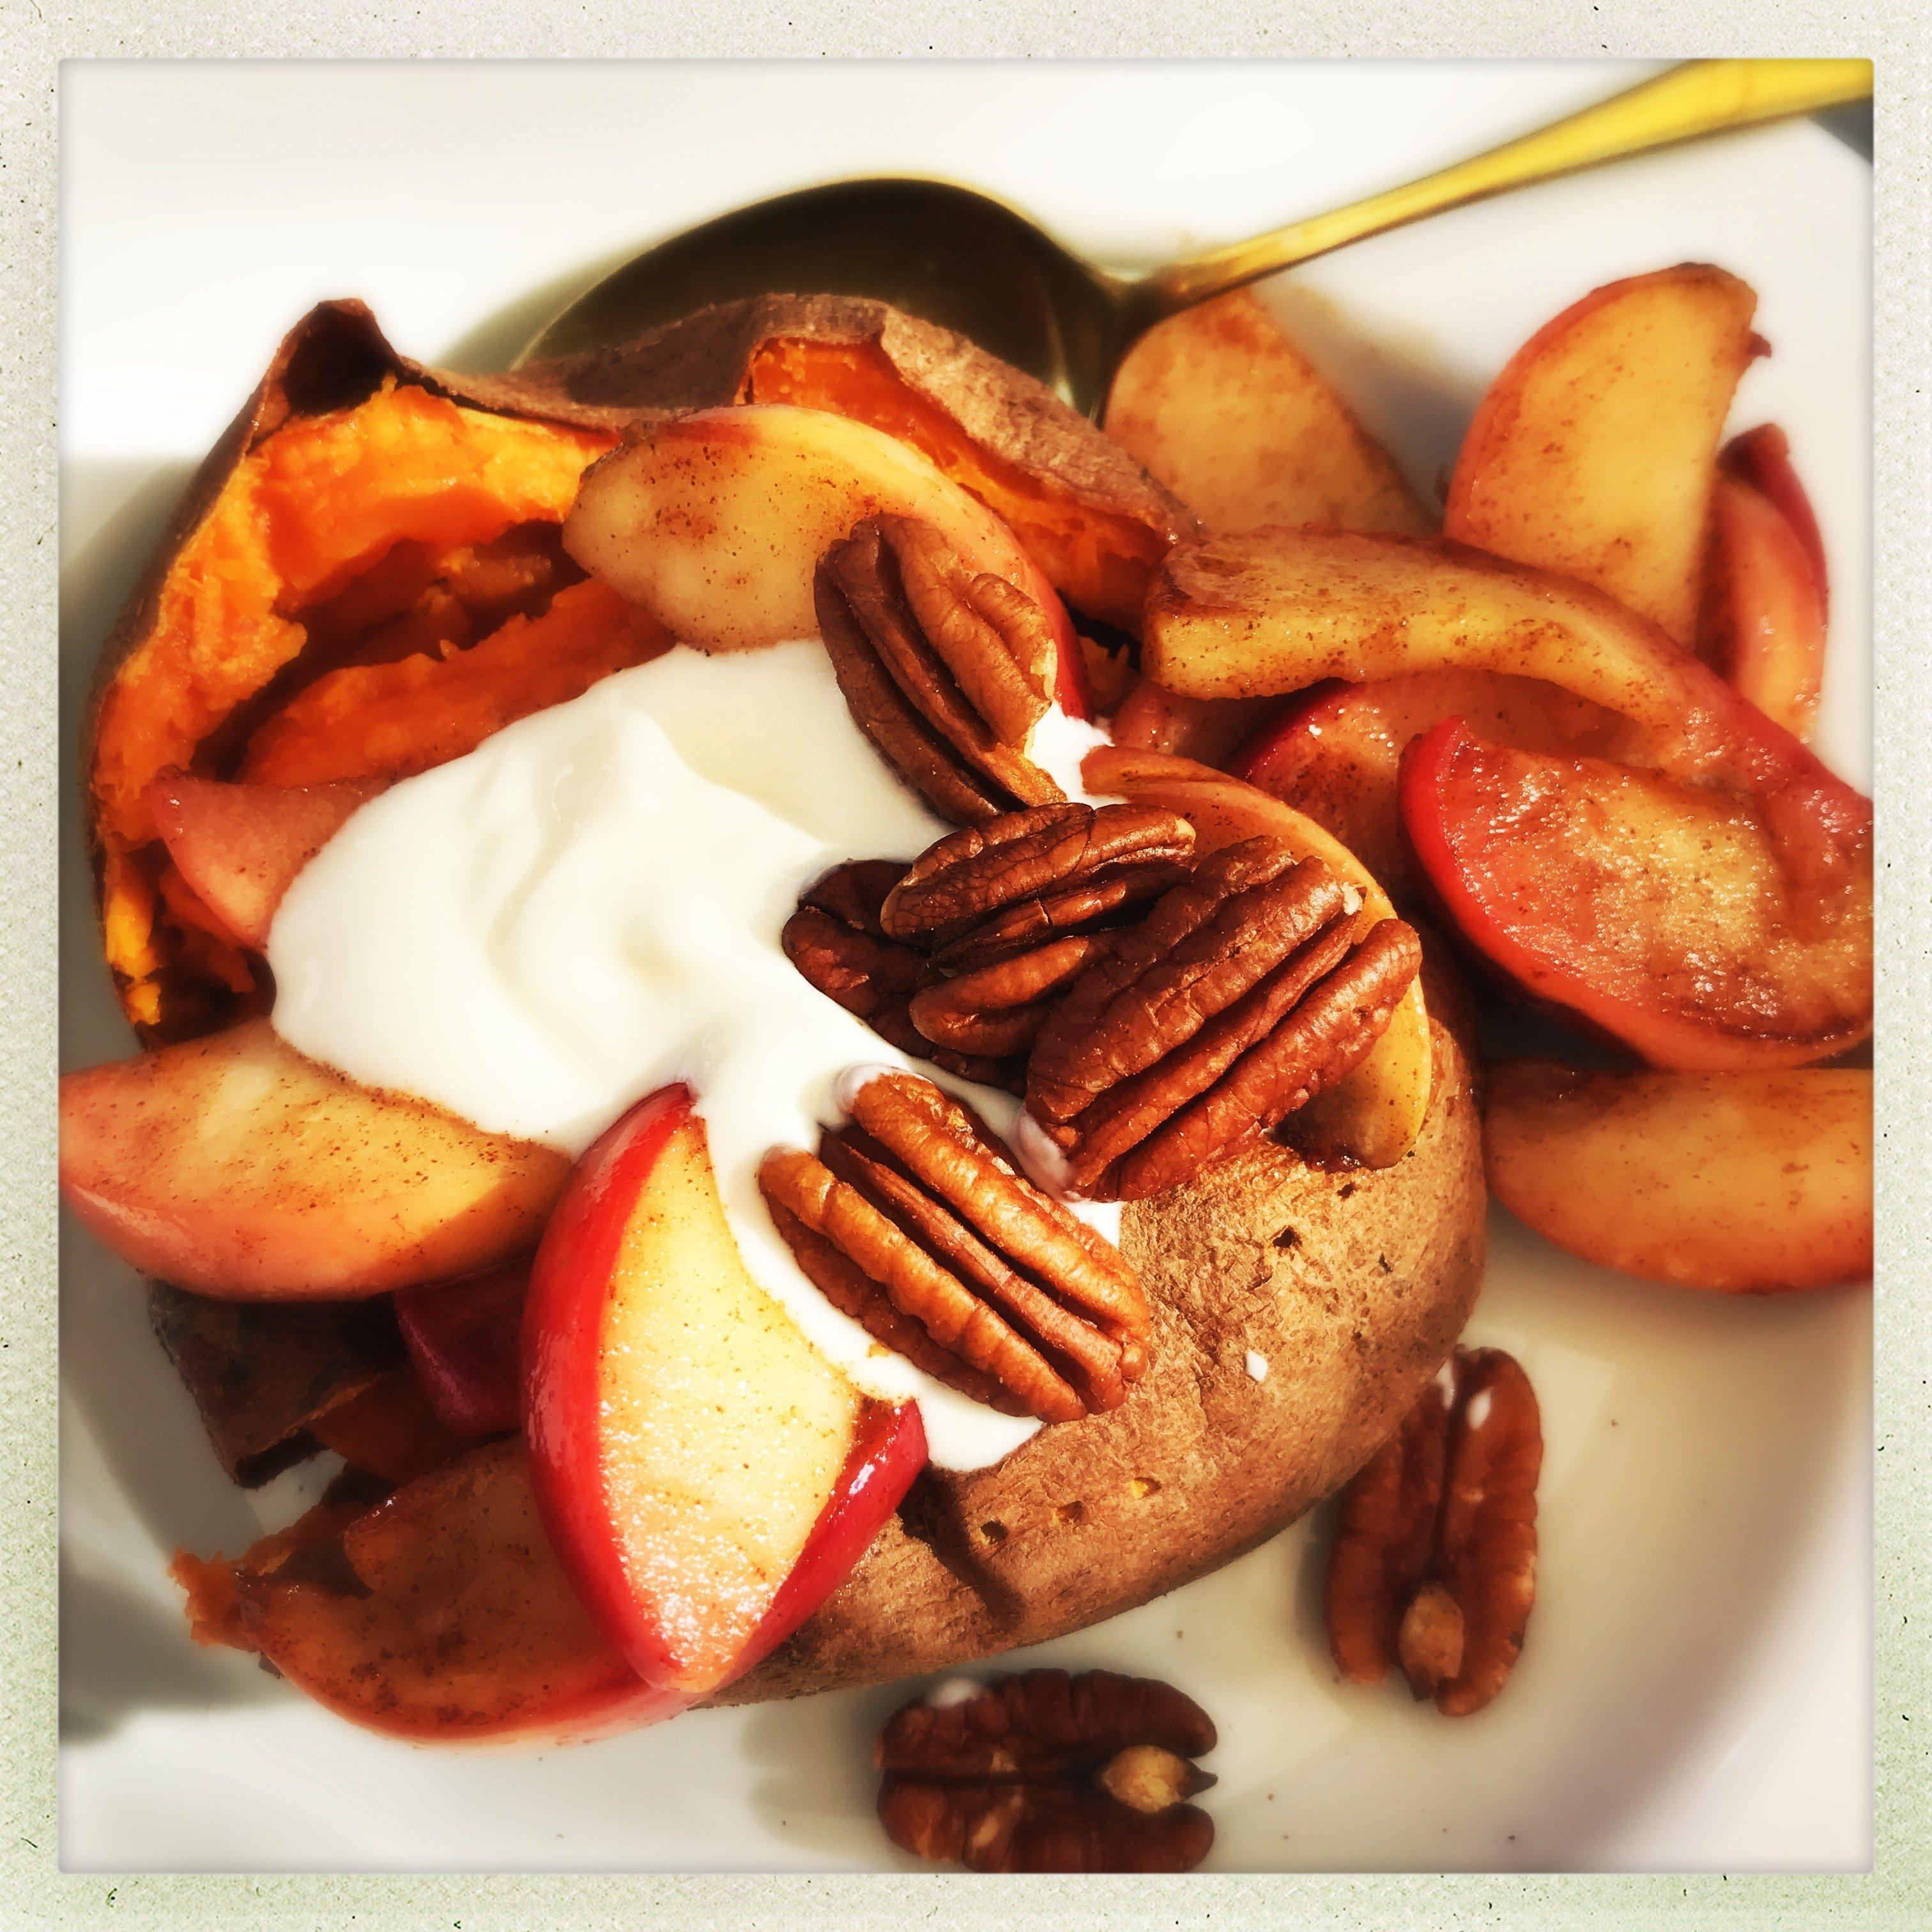 Baked sweet potato with cinnamon apples